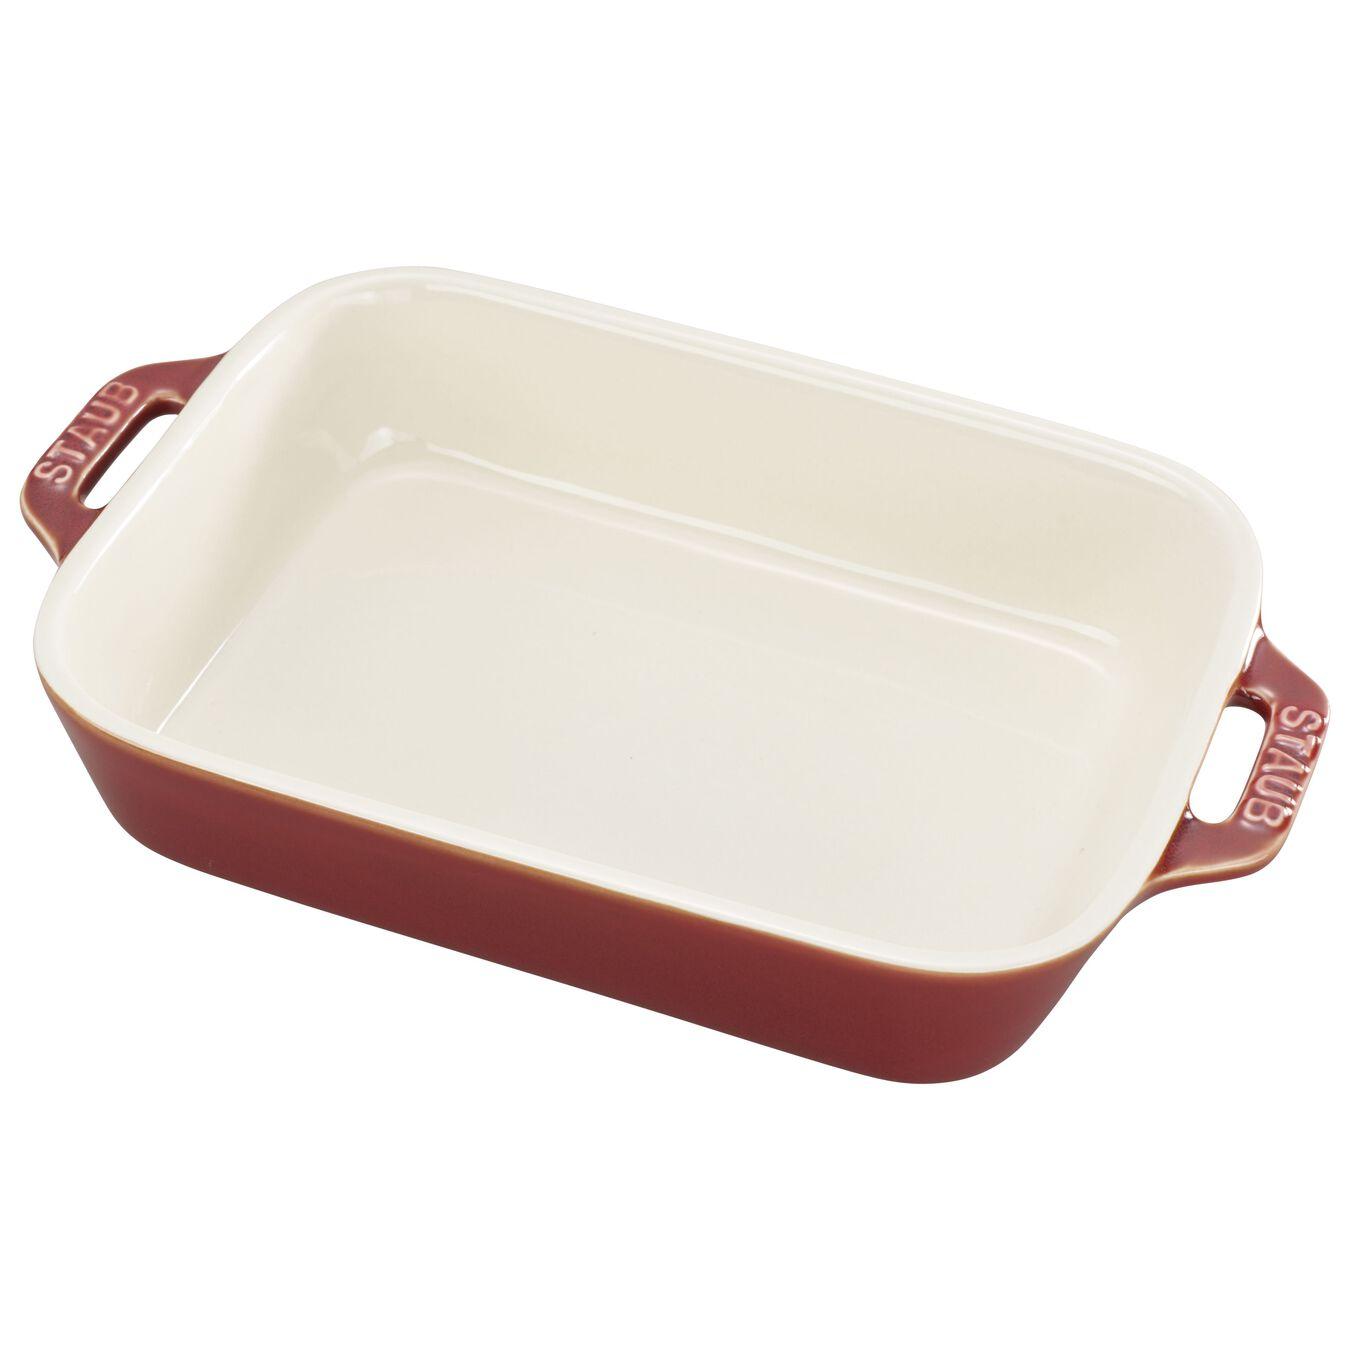 7.5-x 6-inch, rectangular, Baking Dish, rustic red,,large 1